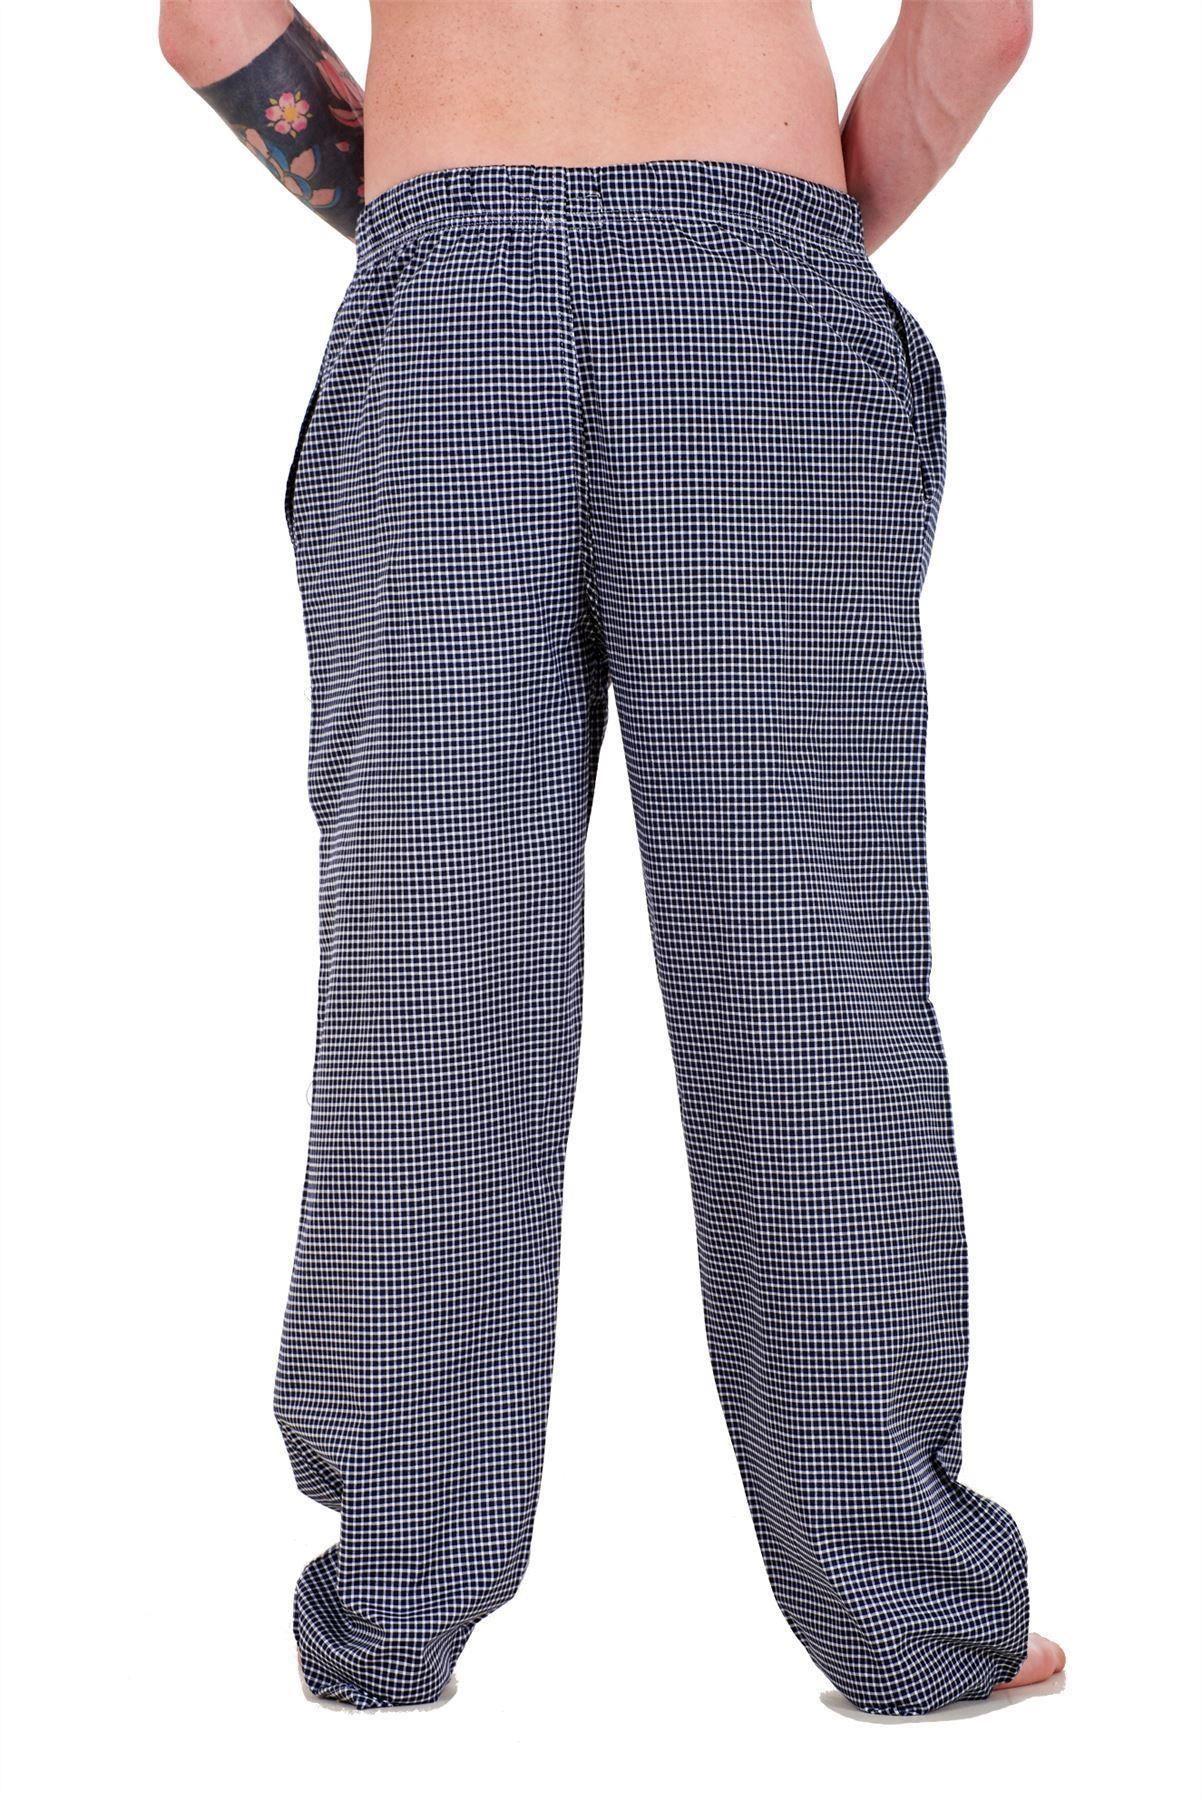 Mens-Pyjama-Bottoms-Rich-Cotton-Woven-Check-Lounge-Pant-Nightwear-Big-3XL-to-5XL Indexbild 48